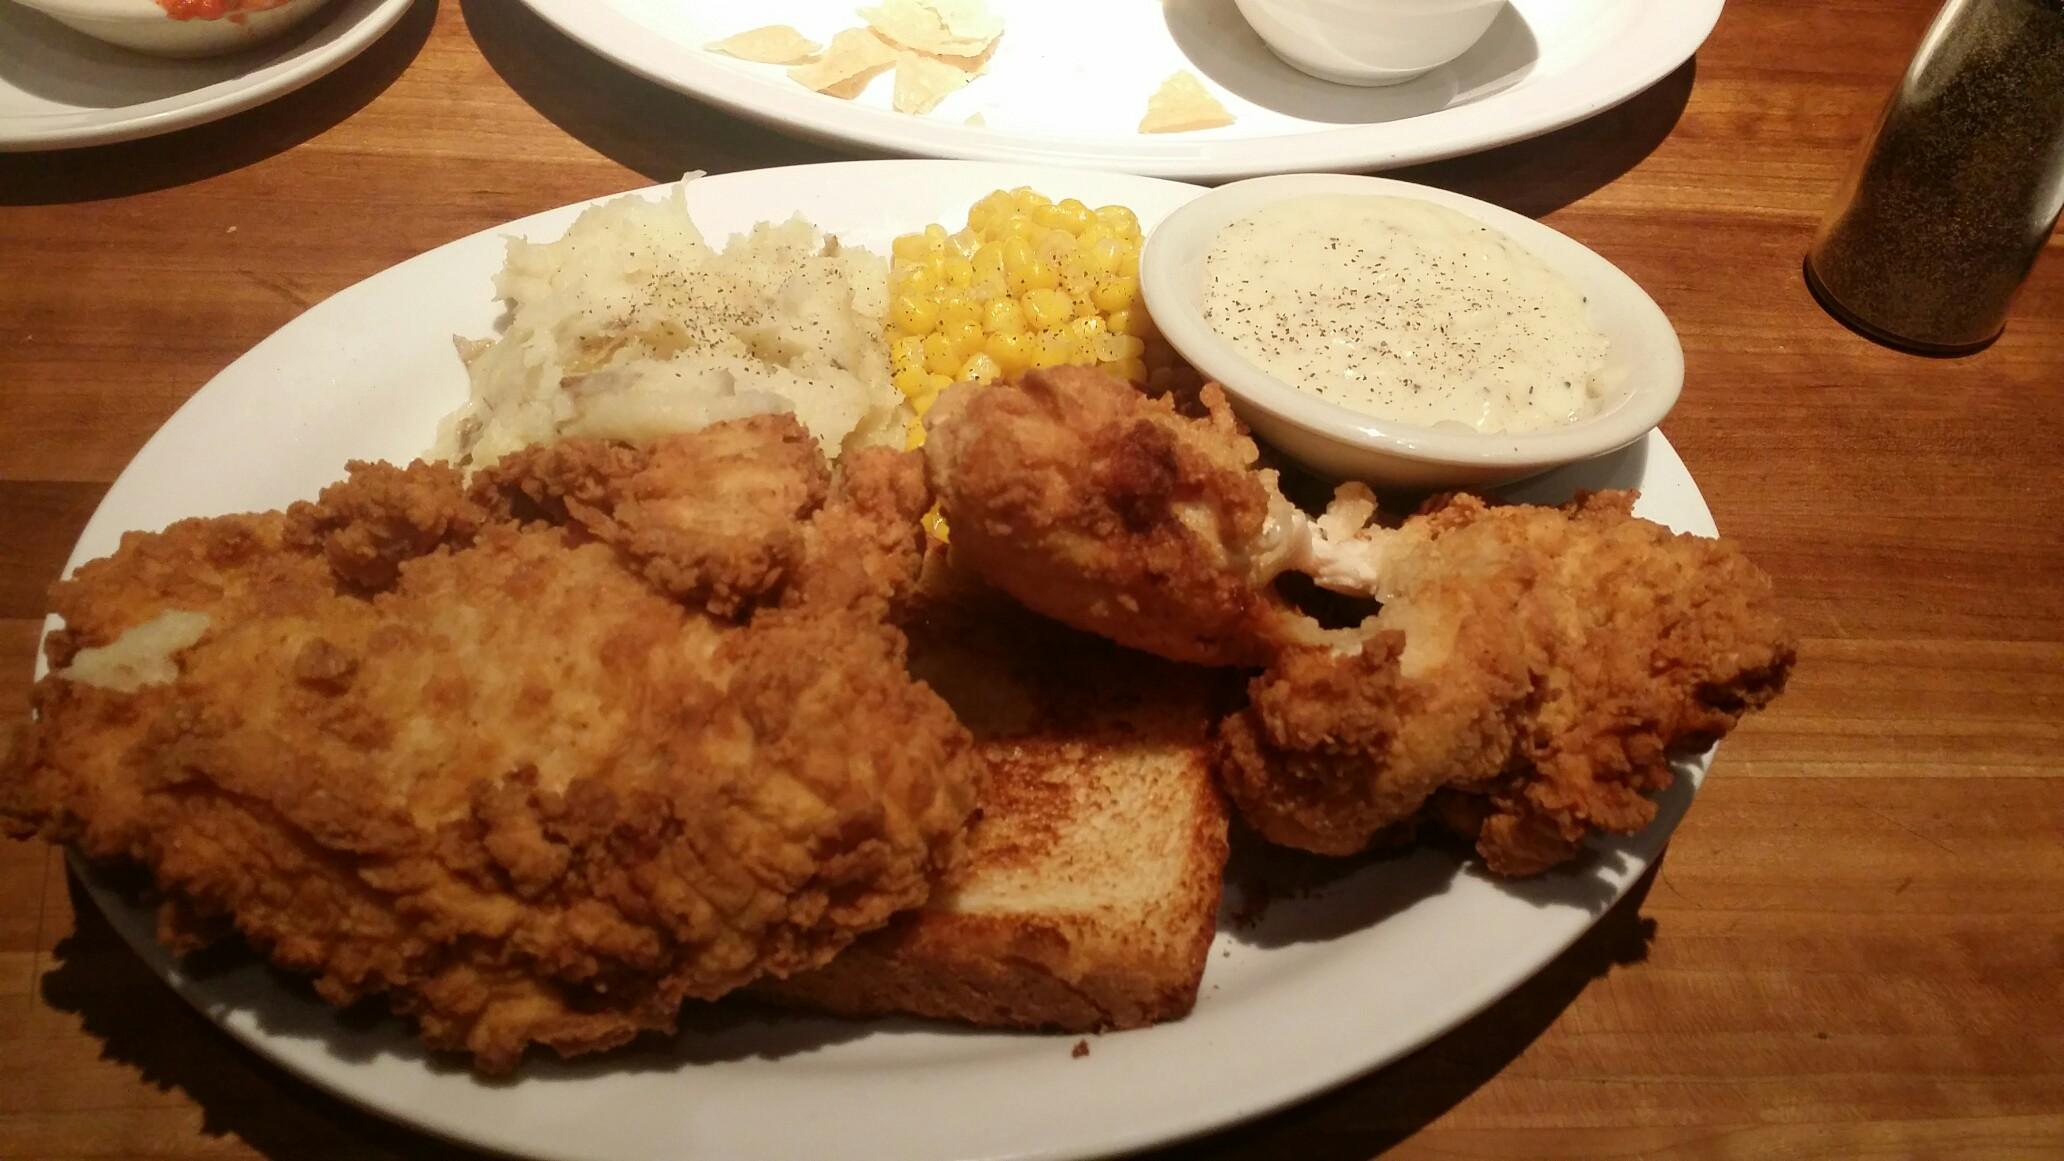 Cheddar S Scratch Kitchen 11865 W 95th St Overland Park Ks 66214 Yp Com